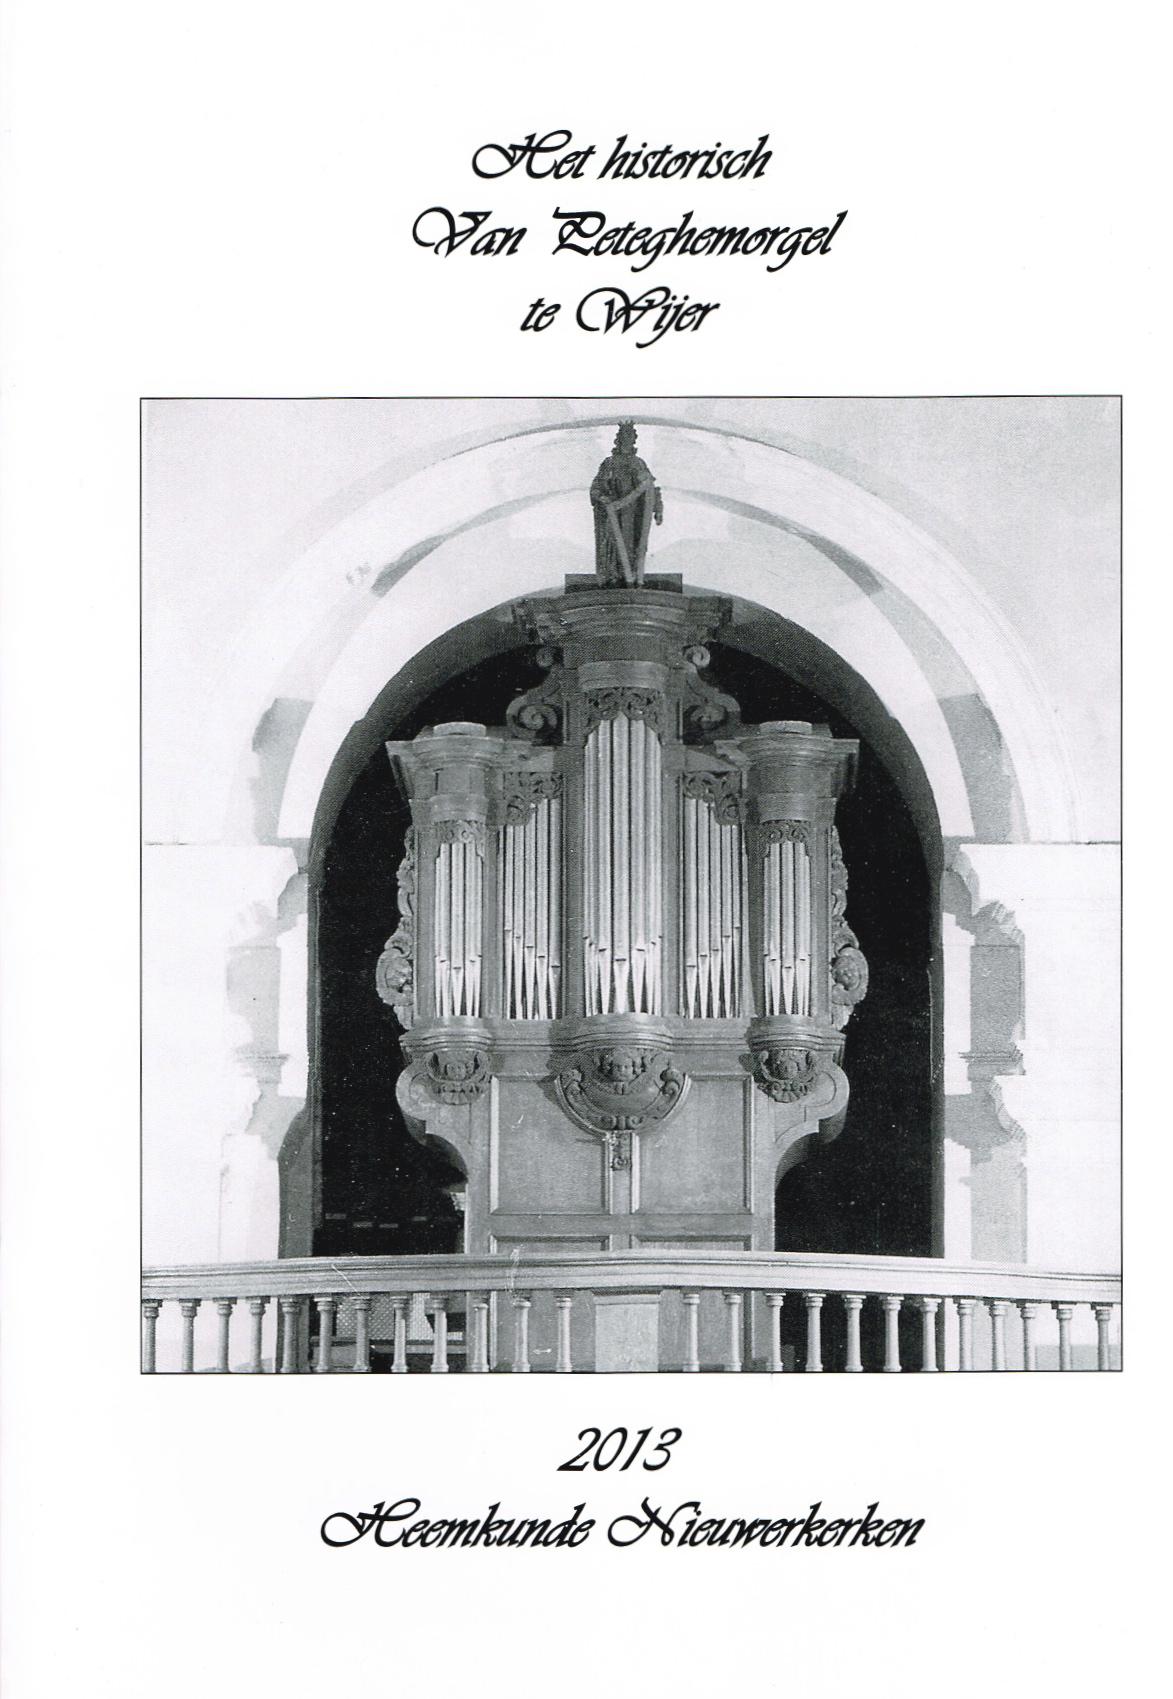 Peteghem Orgel Wijer21042013